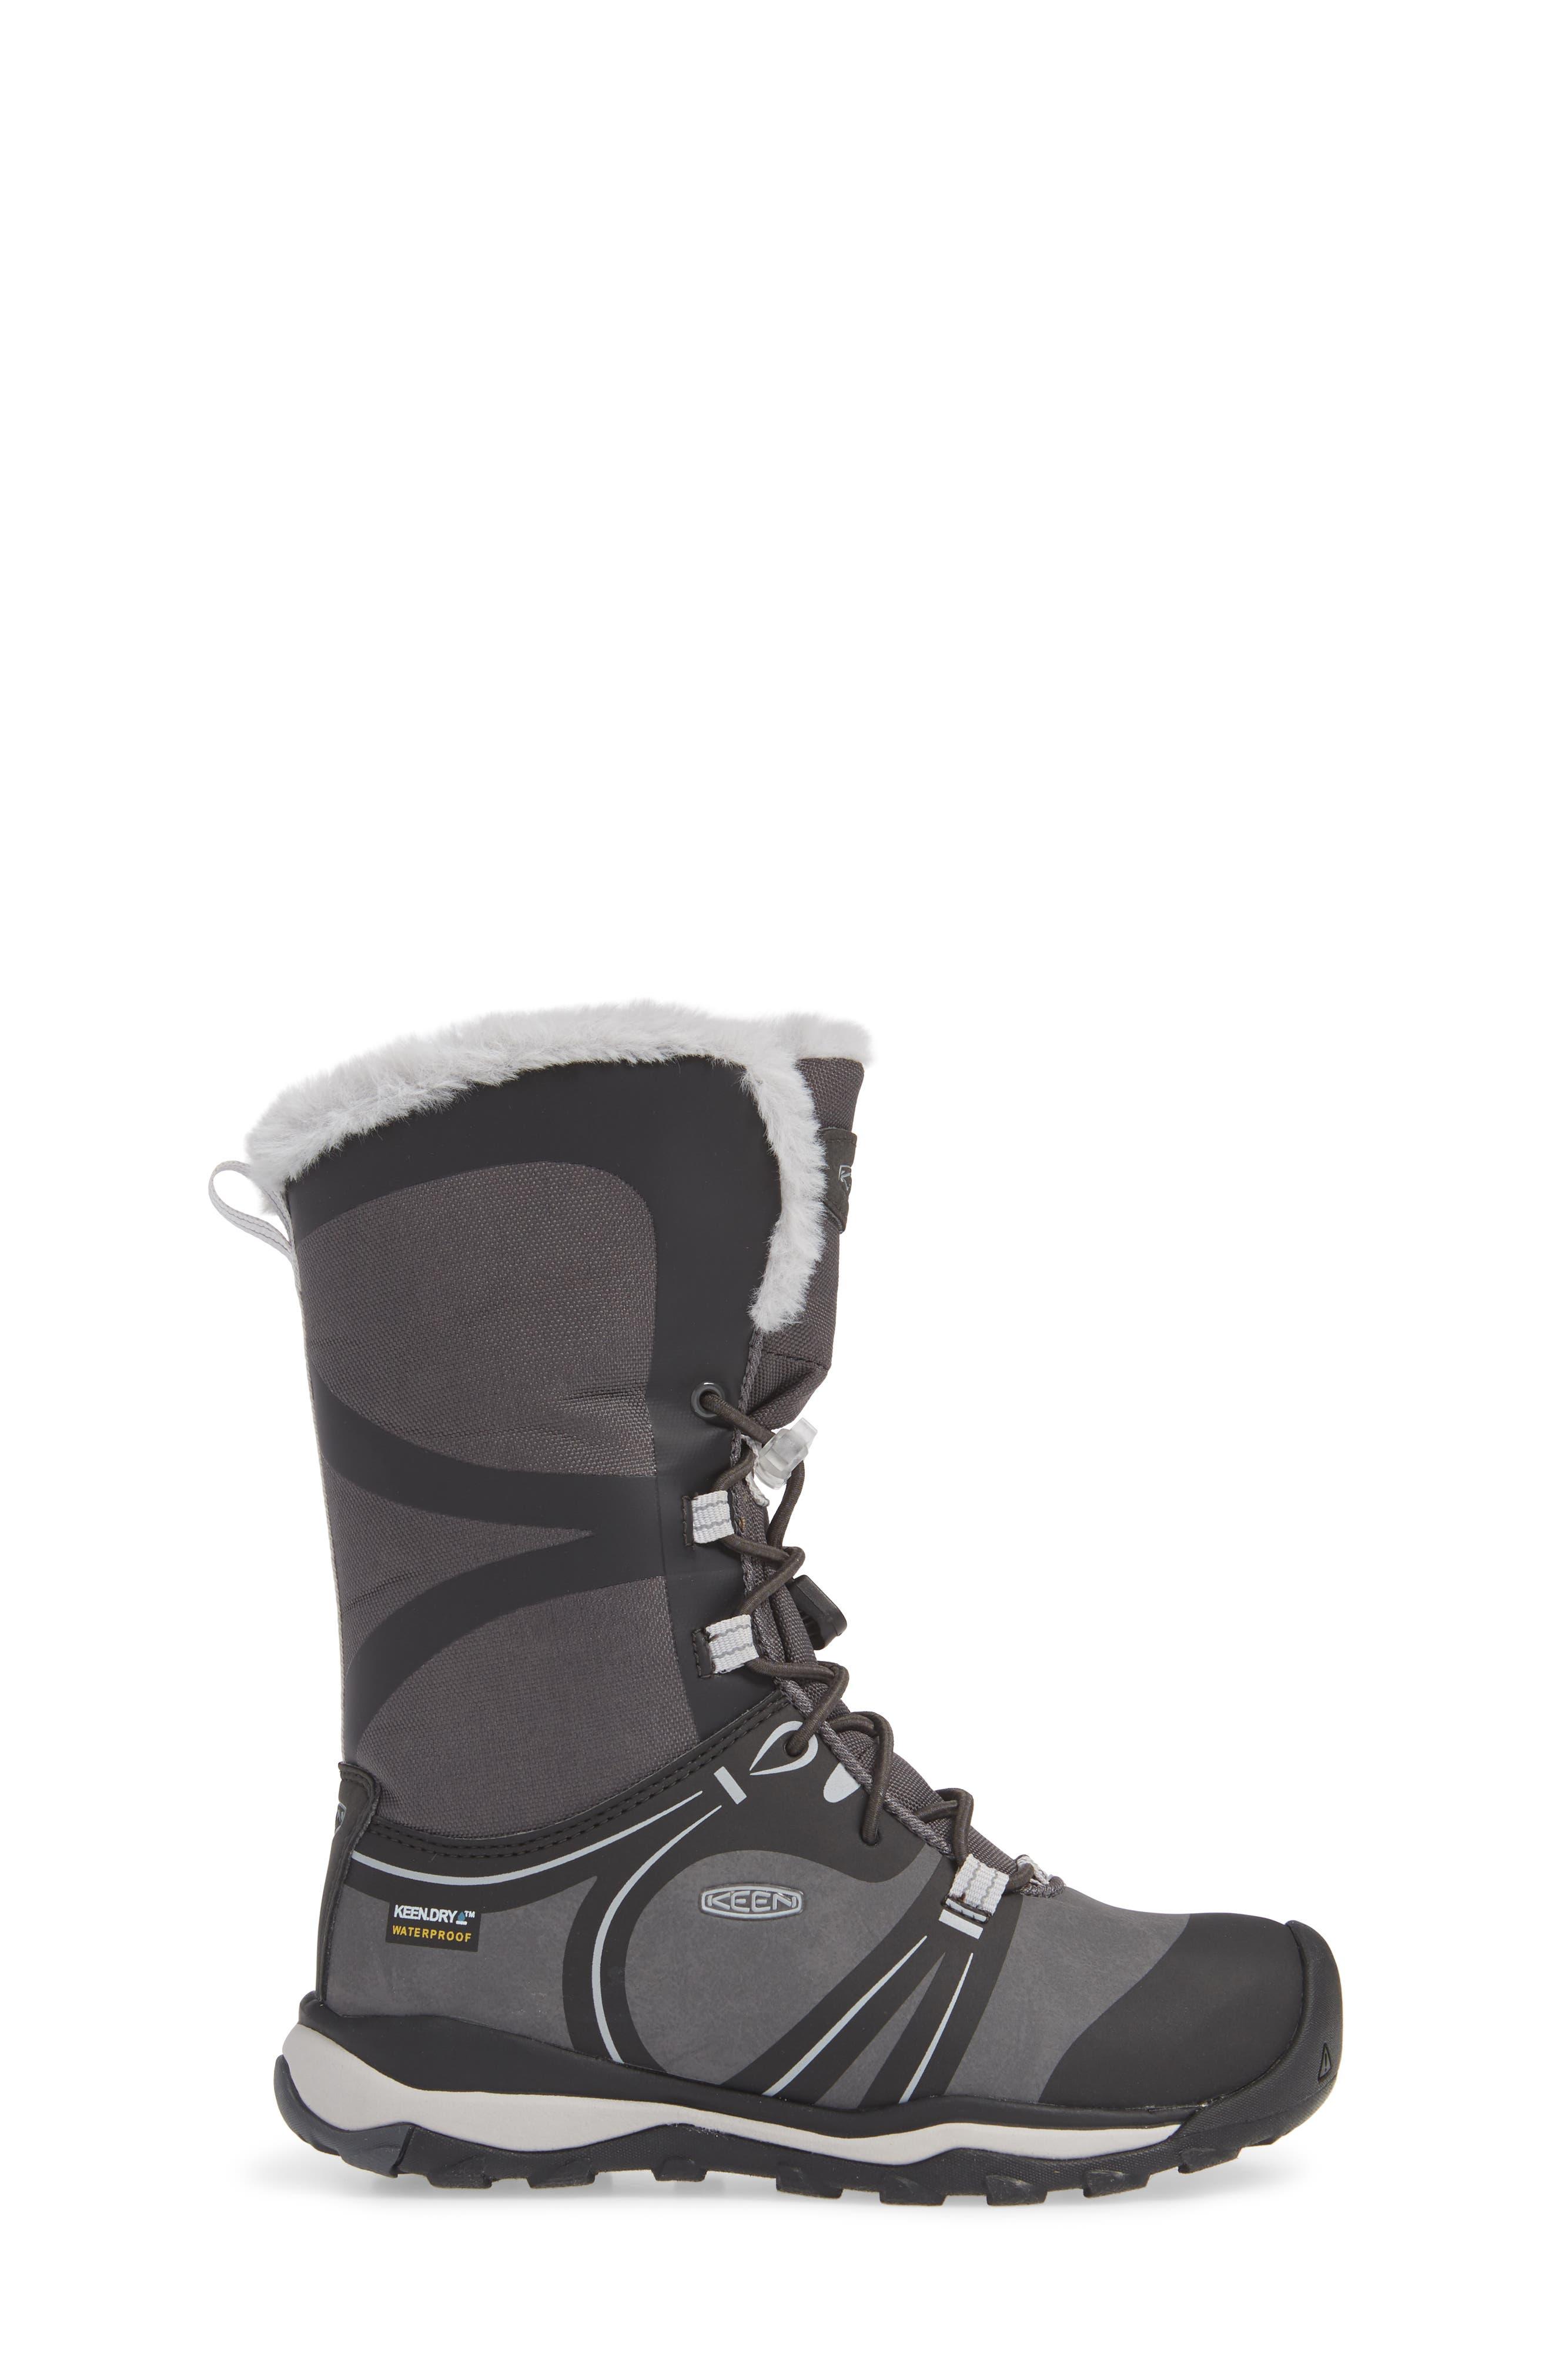 KEEN, Terradora Faux Fur Trim Waterproof Snow Boot, Alternate thumbnail 3, color, RAVEN/ VAPOR